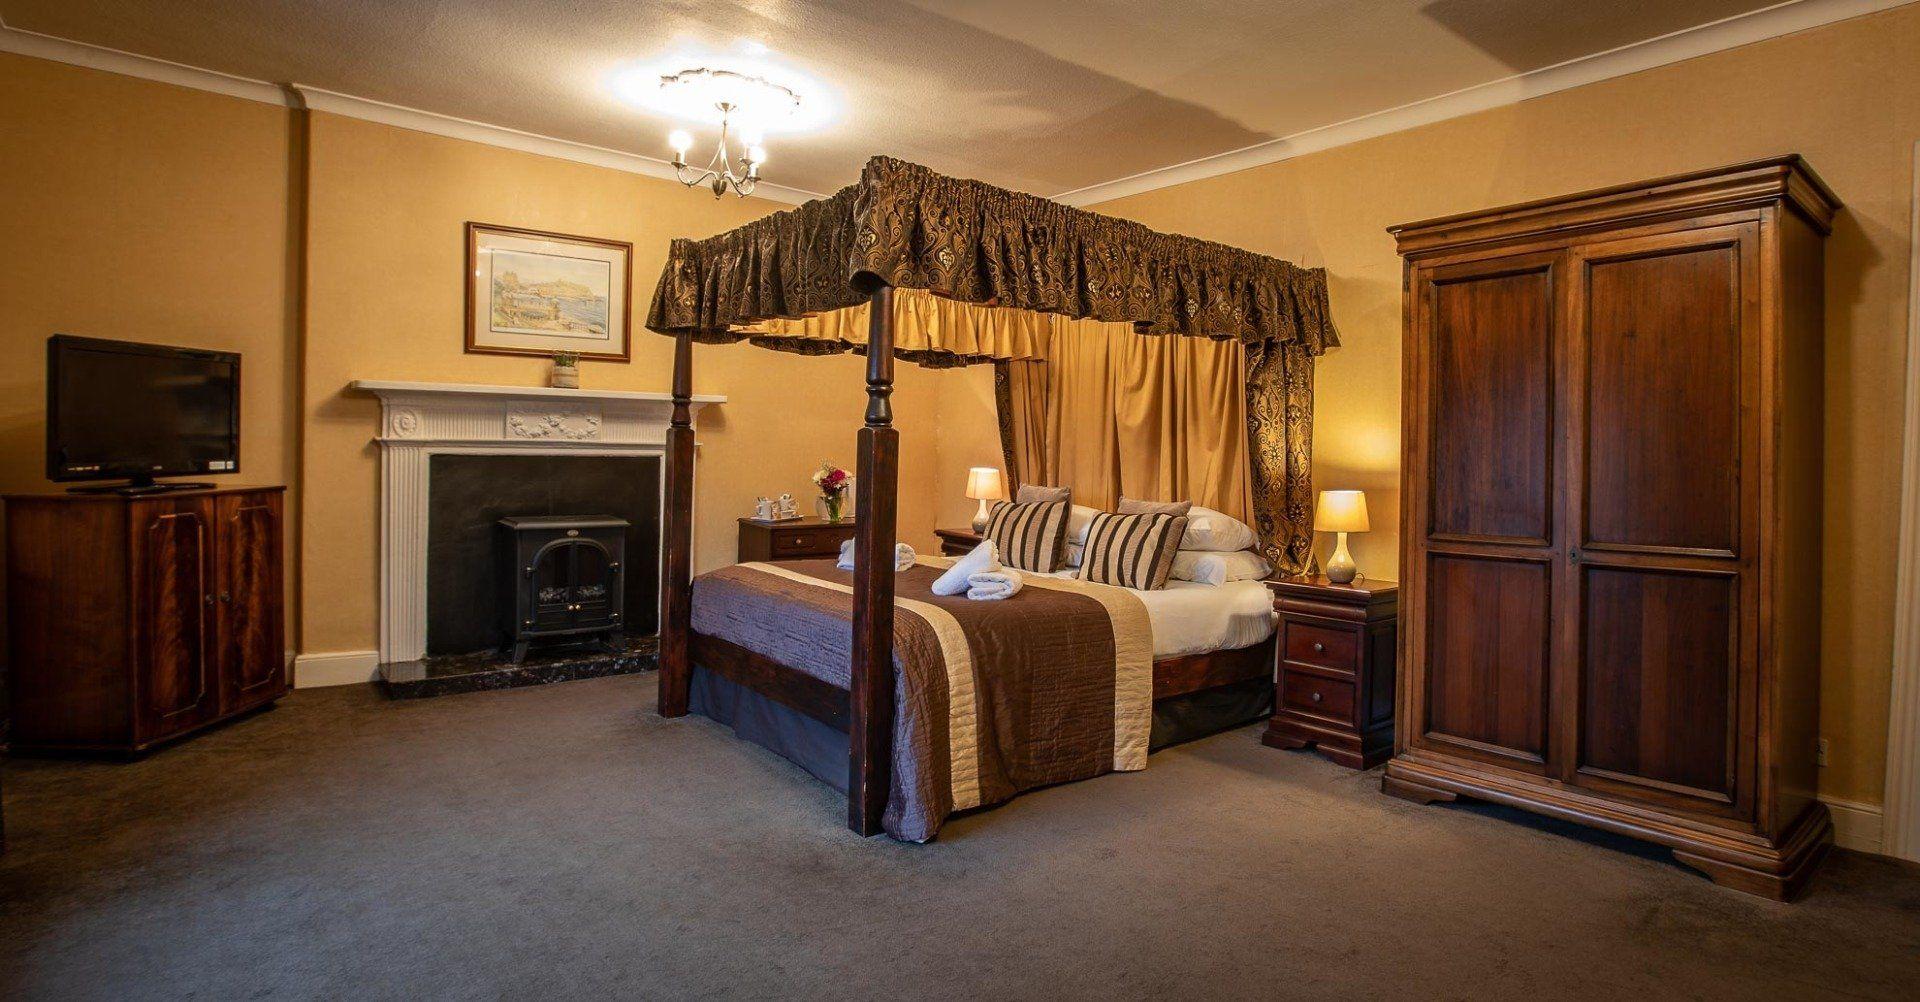 East Ayton Lodge Hotel, Scarborough, North Yorkshire